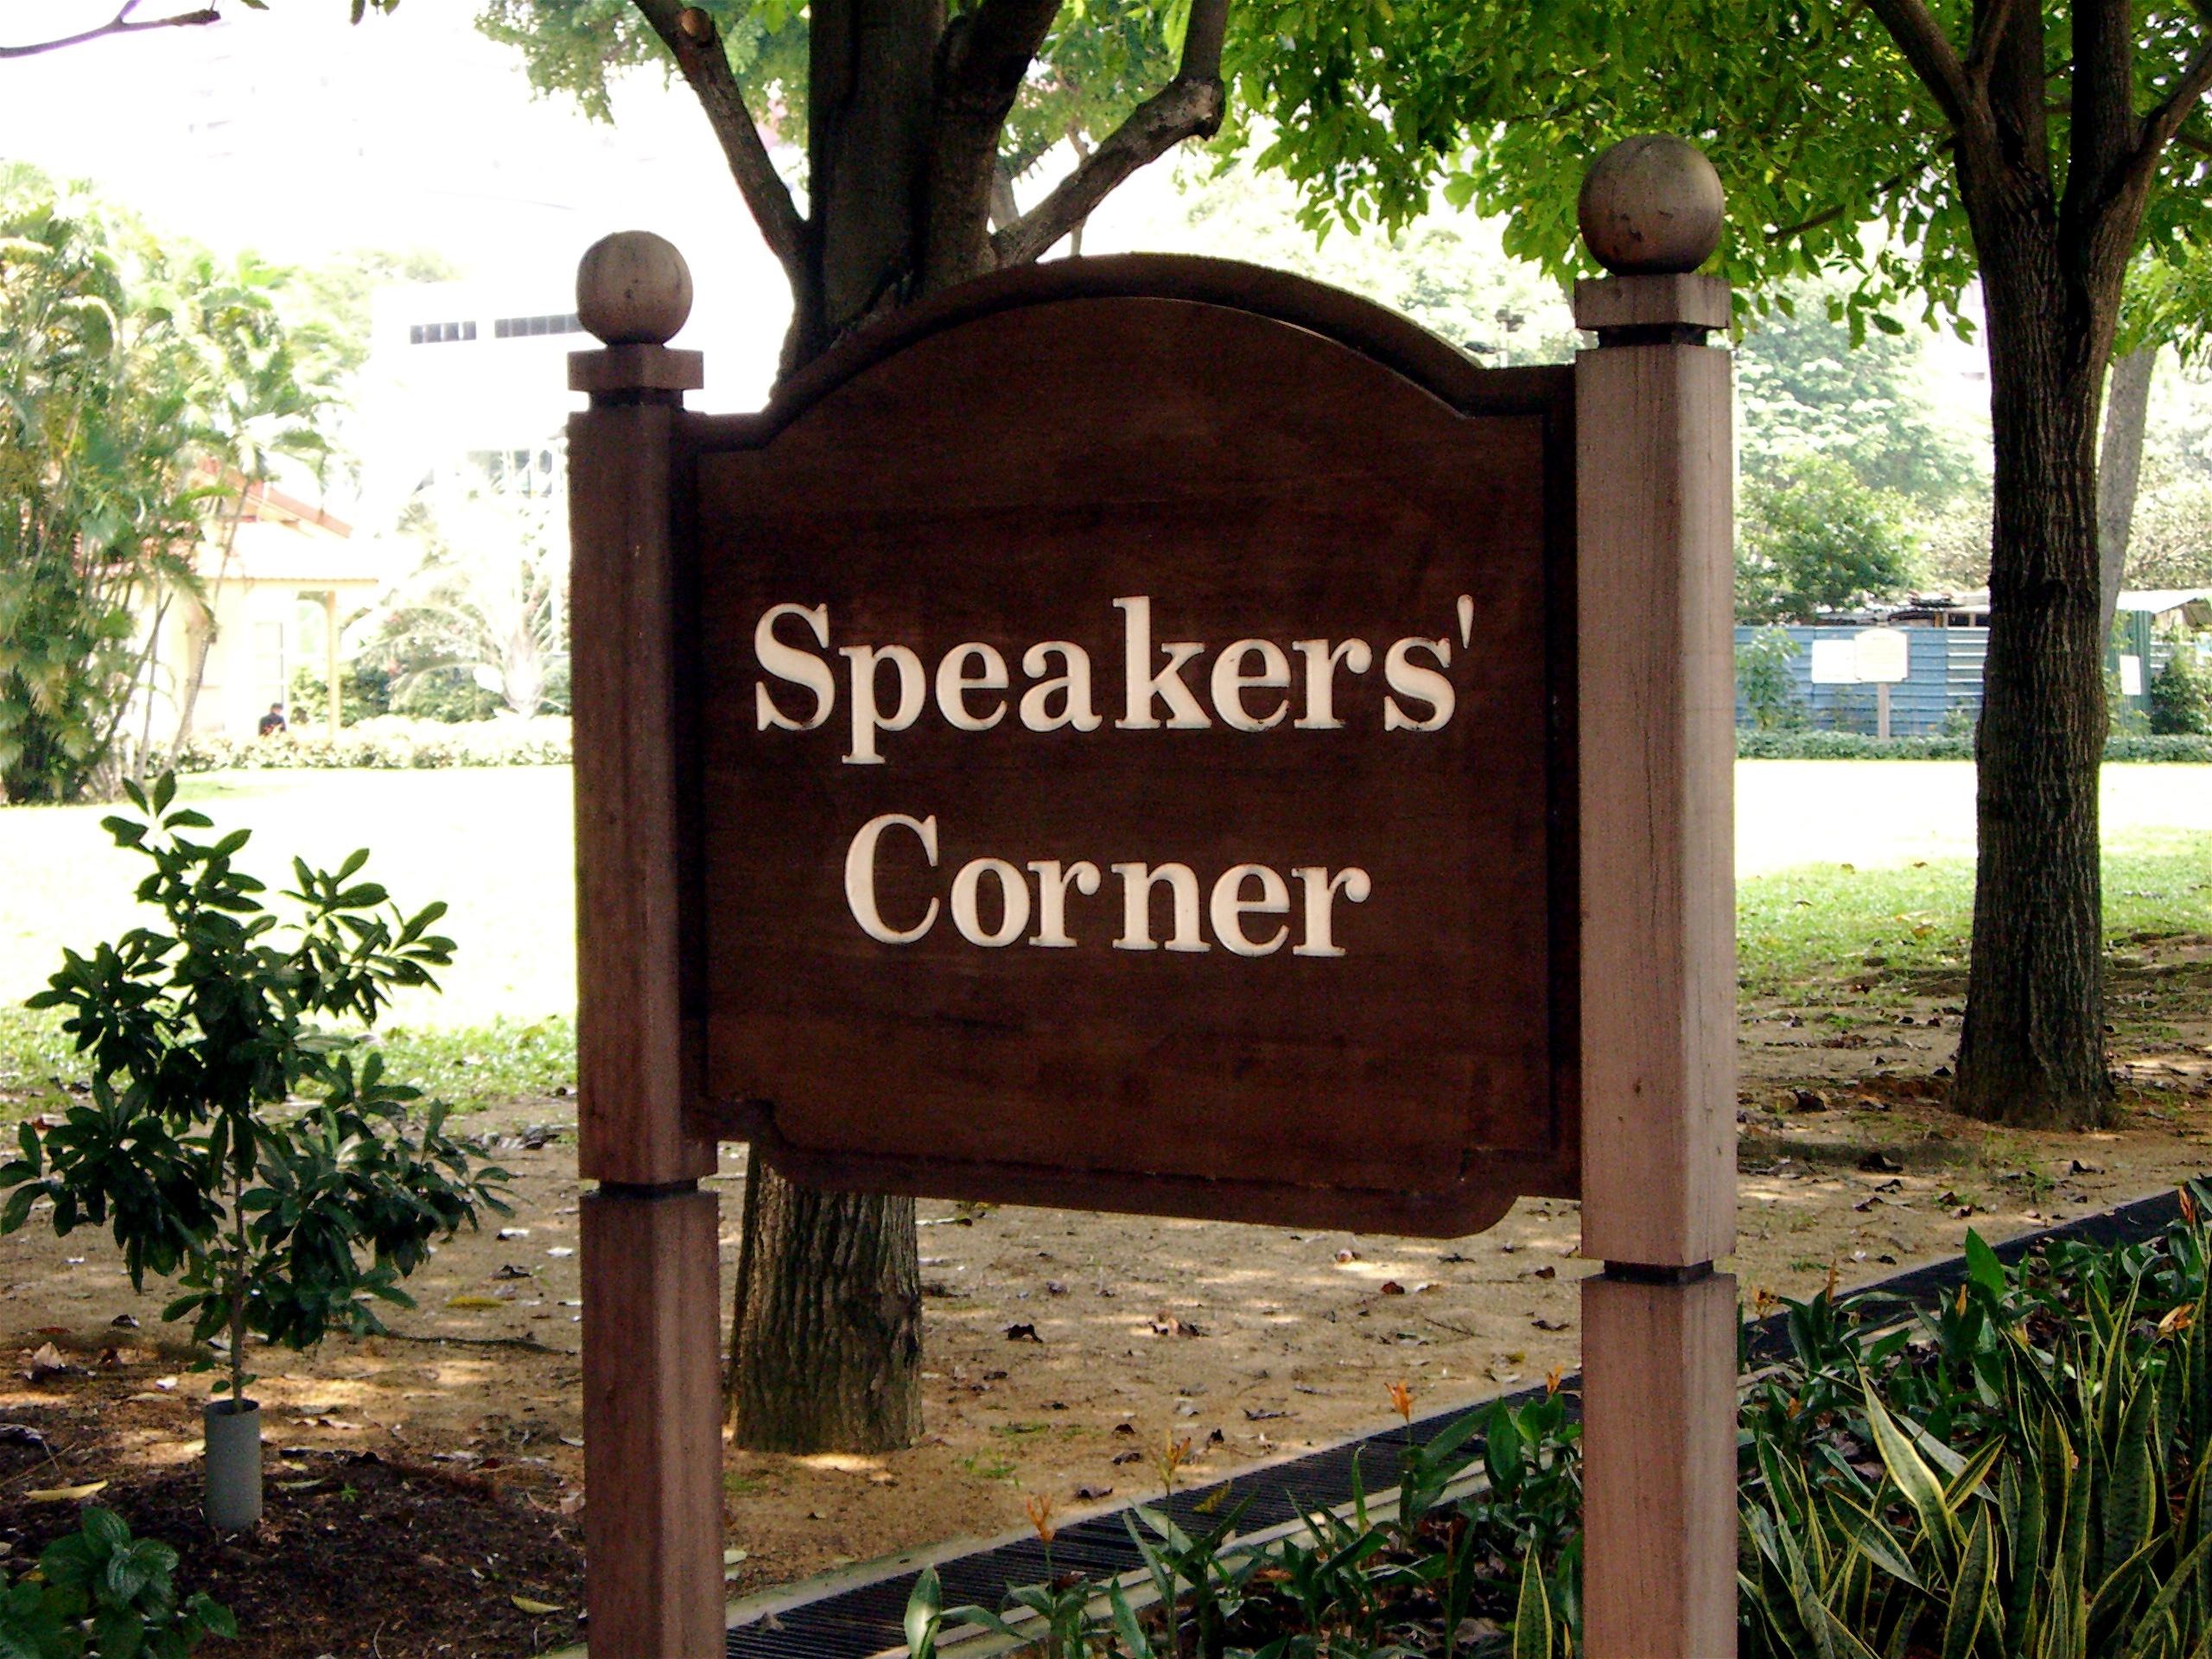 Speakers_Corner_sign.jpg